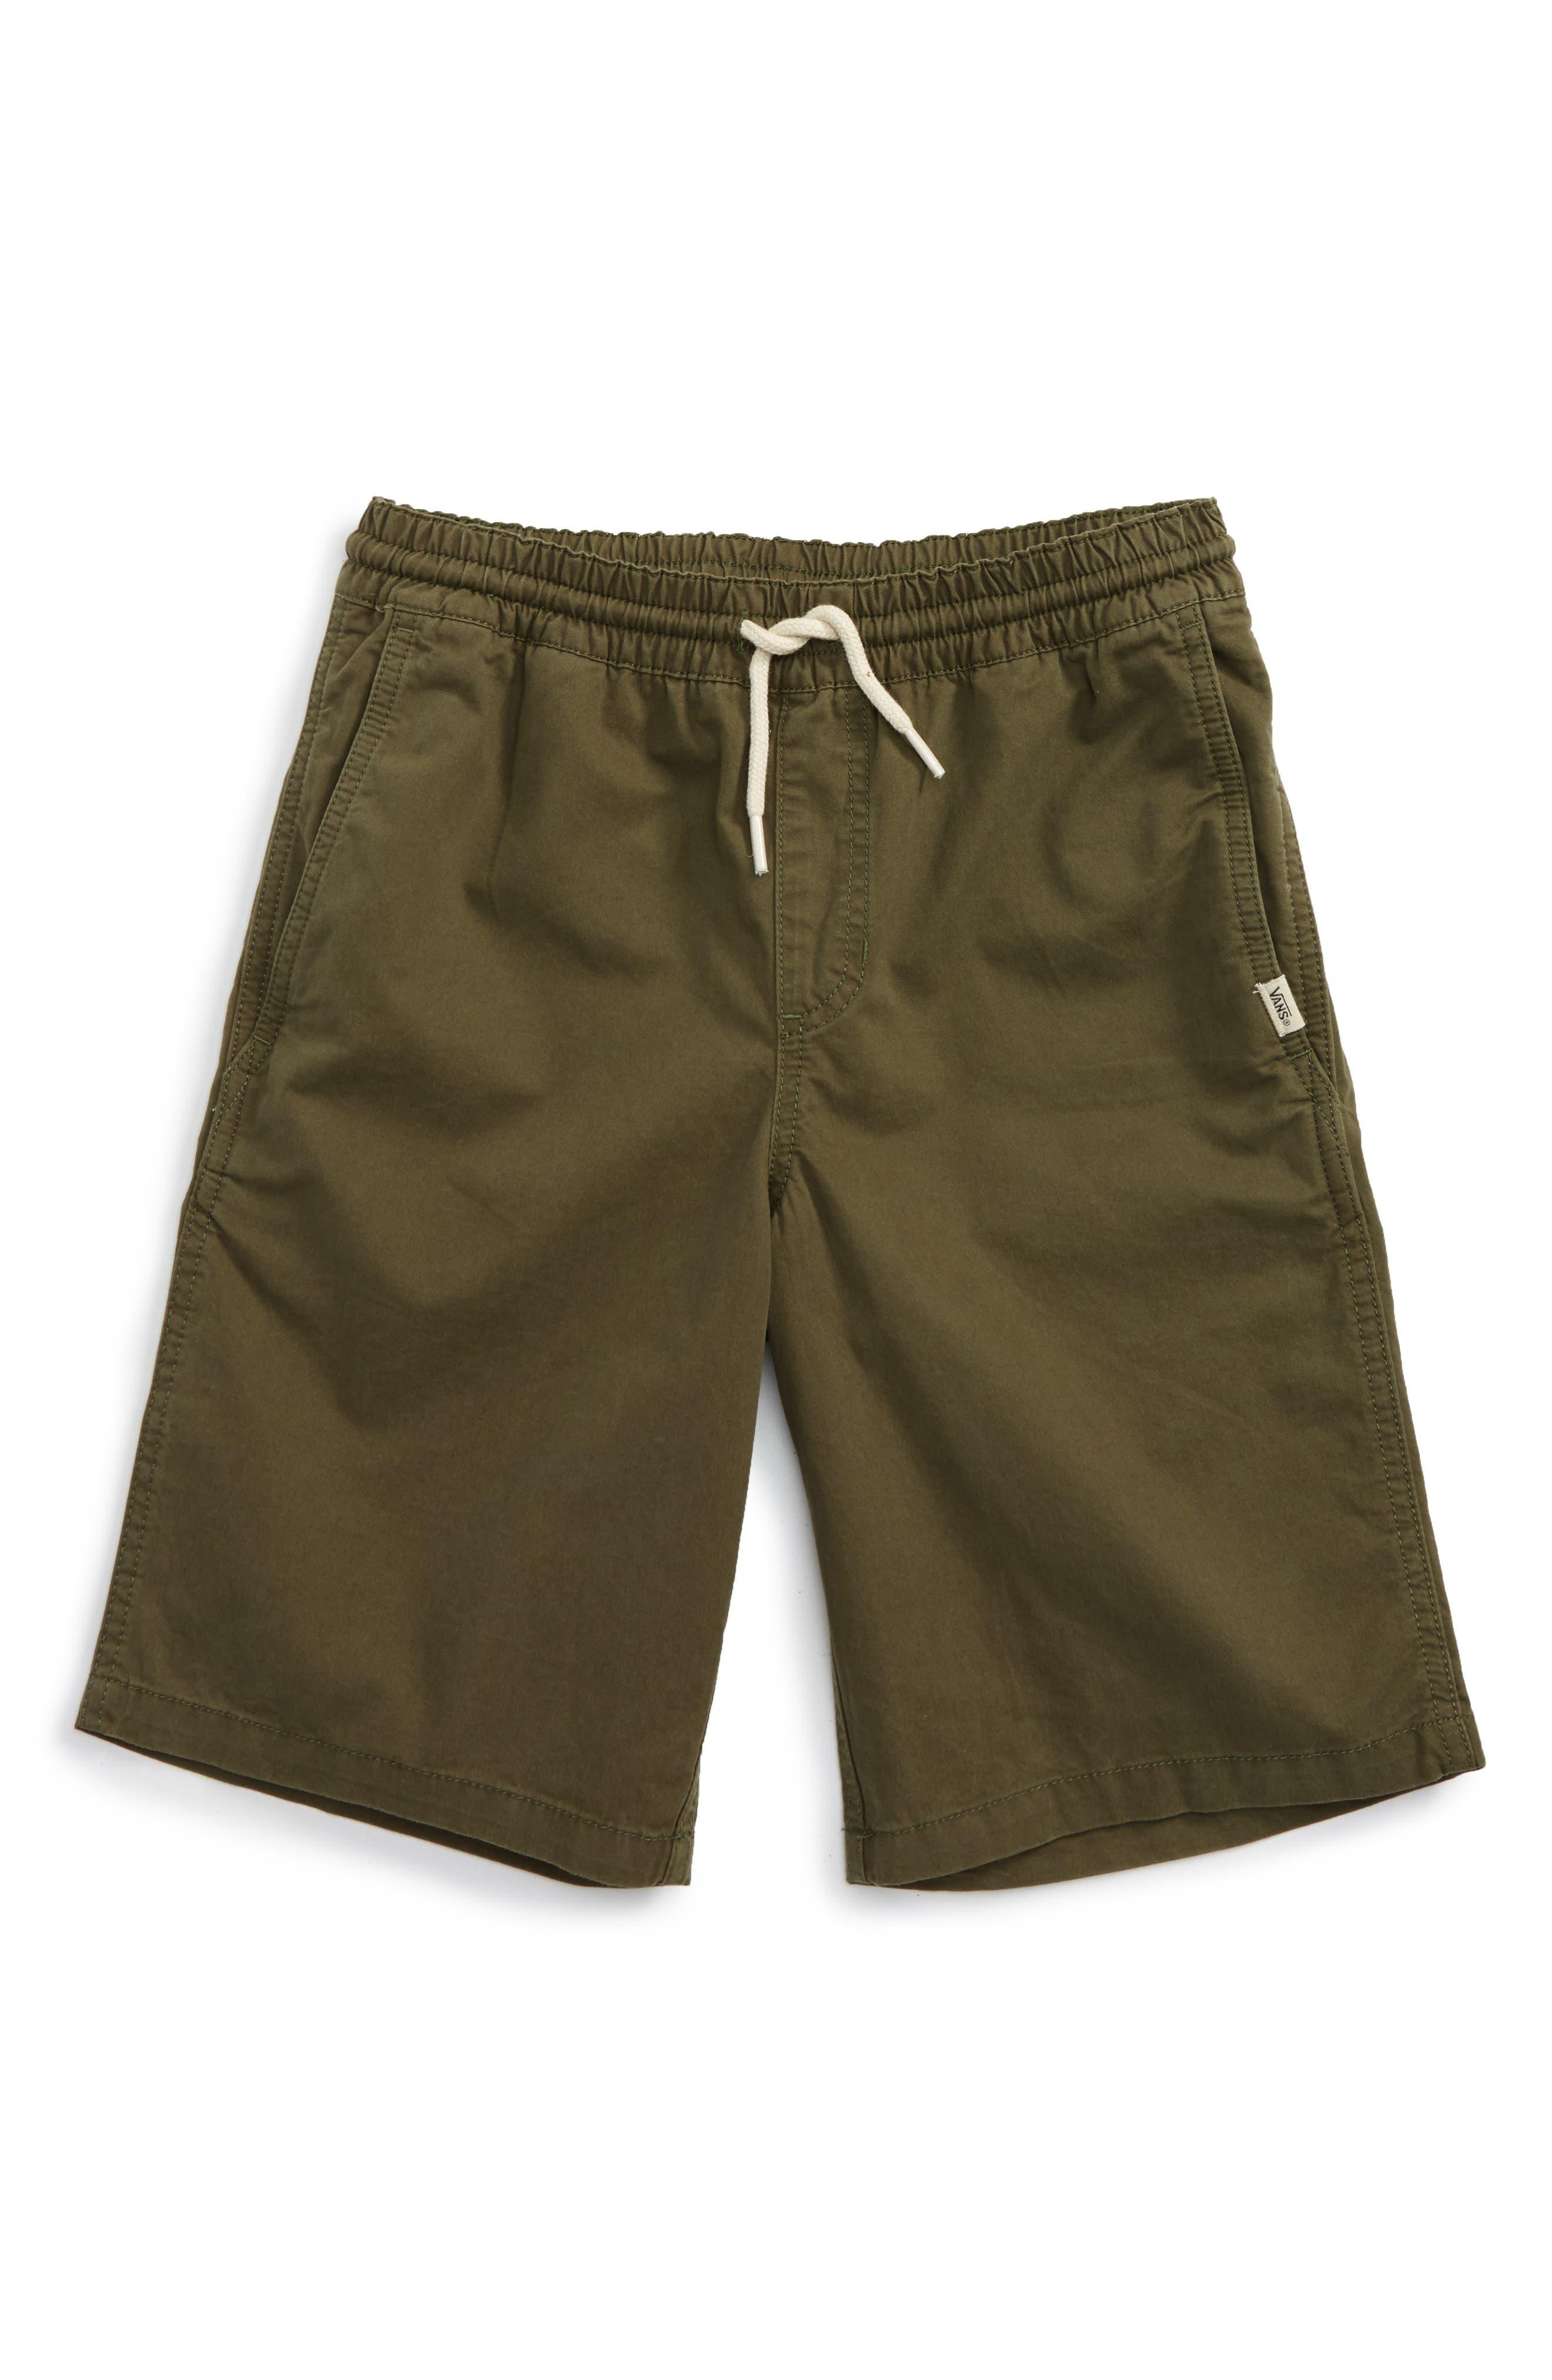 Vans Range Shorts (Big Boys)